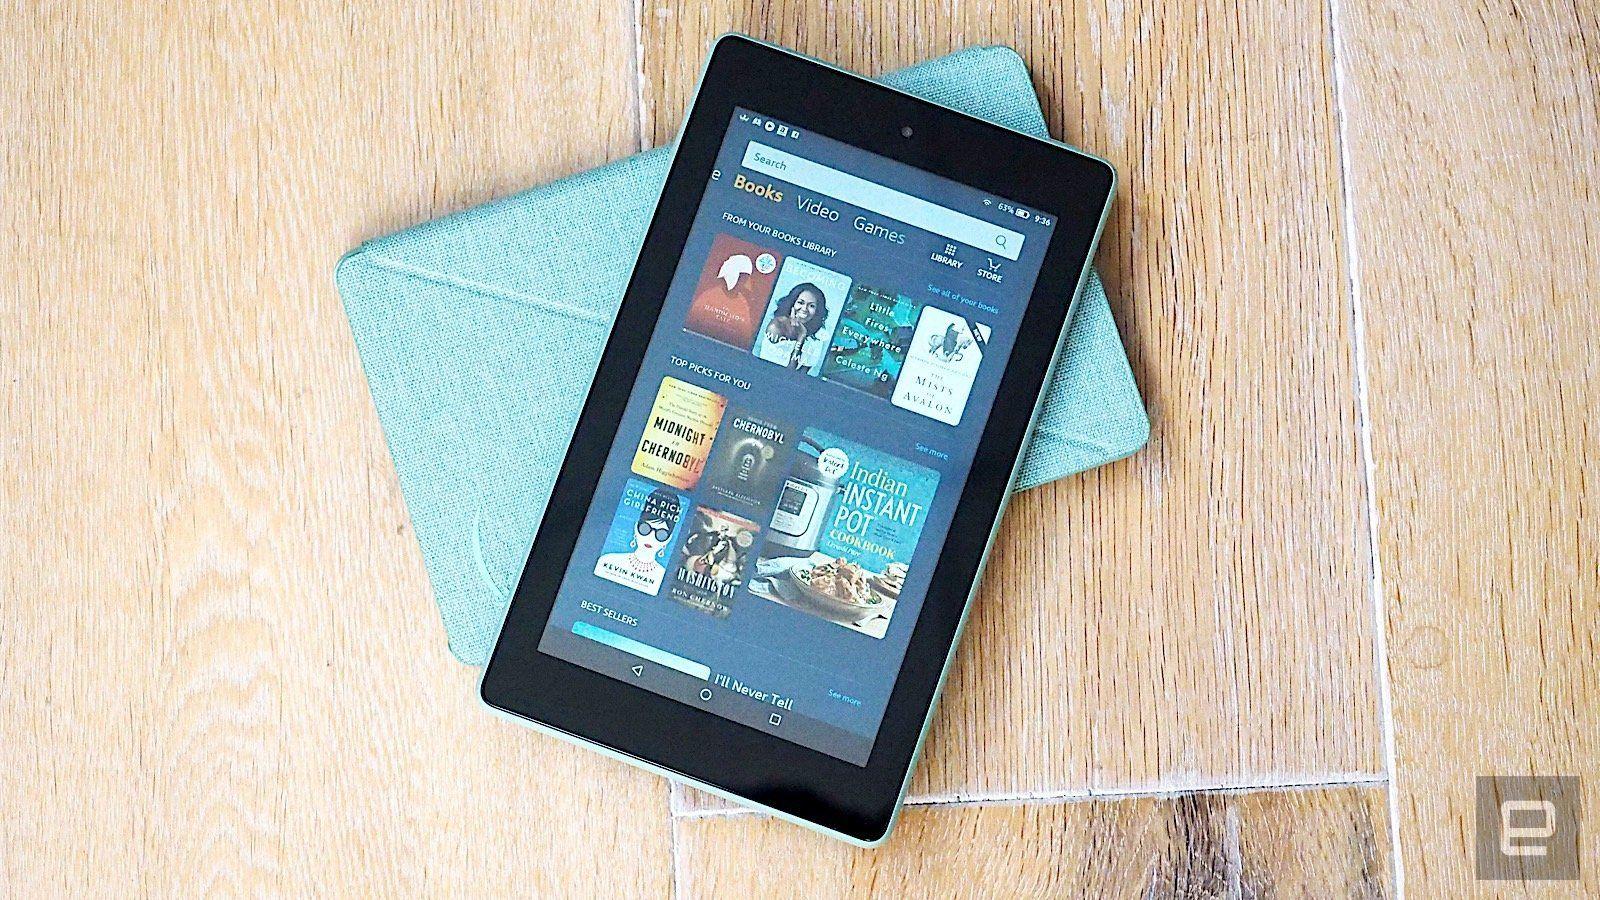 Amazon Fire 7 tablet